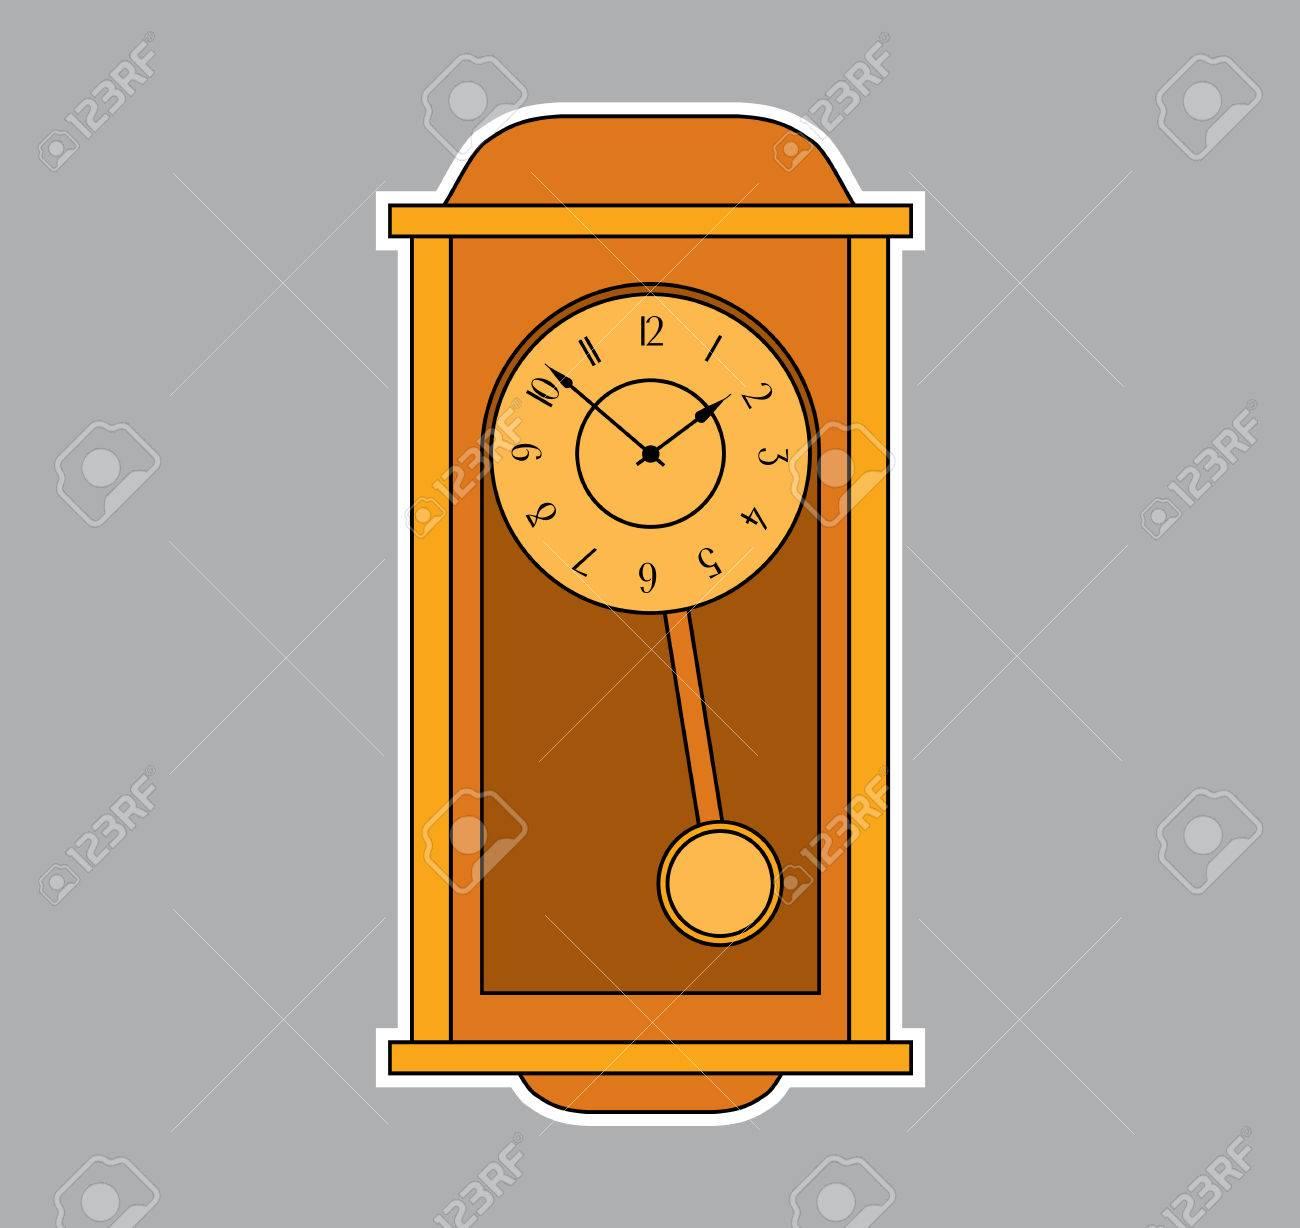 Orange wall clock retro images home wall decoration ideas jordan retro wall clock gallery home wall decoration ideas orange wall clock retro images home wall amipublicfo Gallery